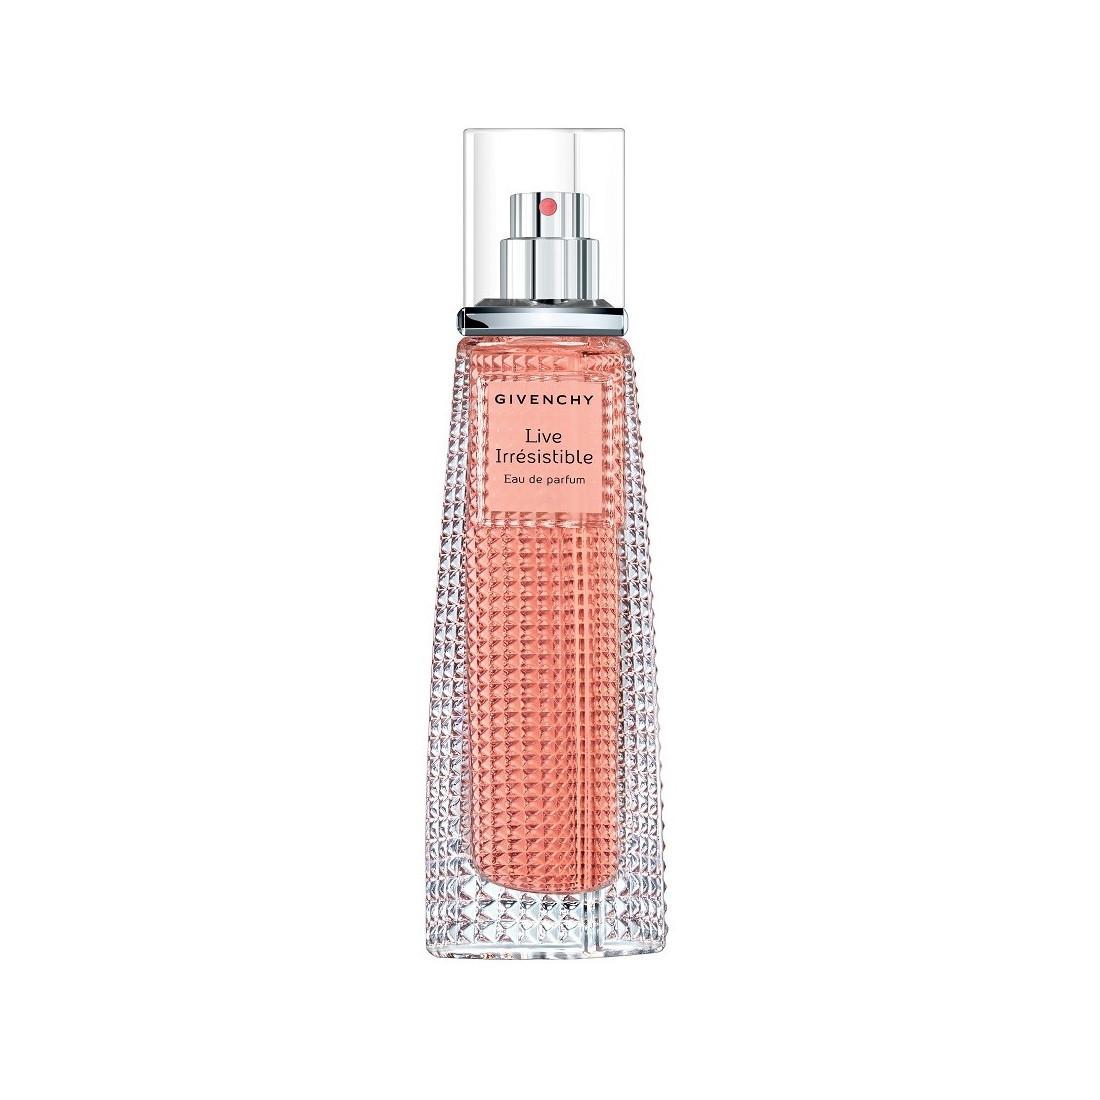 Givenchy Live Irresistible Eau De Parfum Spray 20 ml